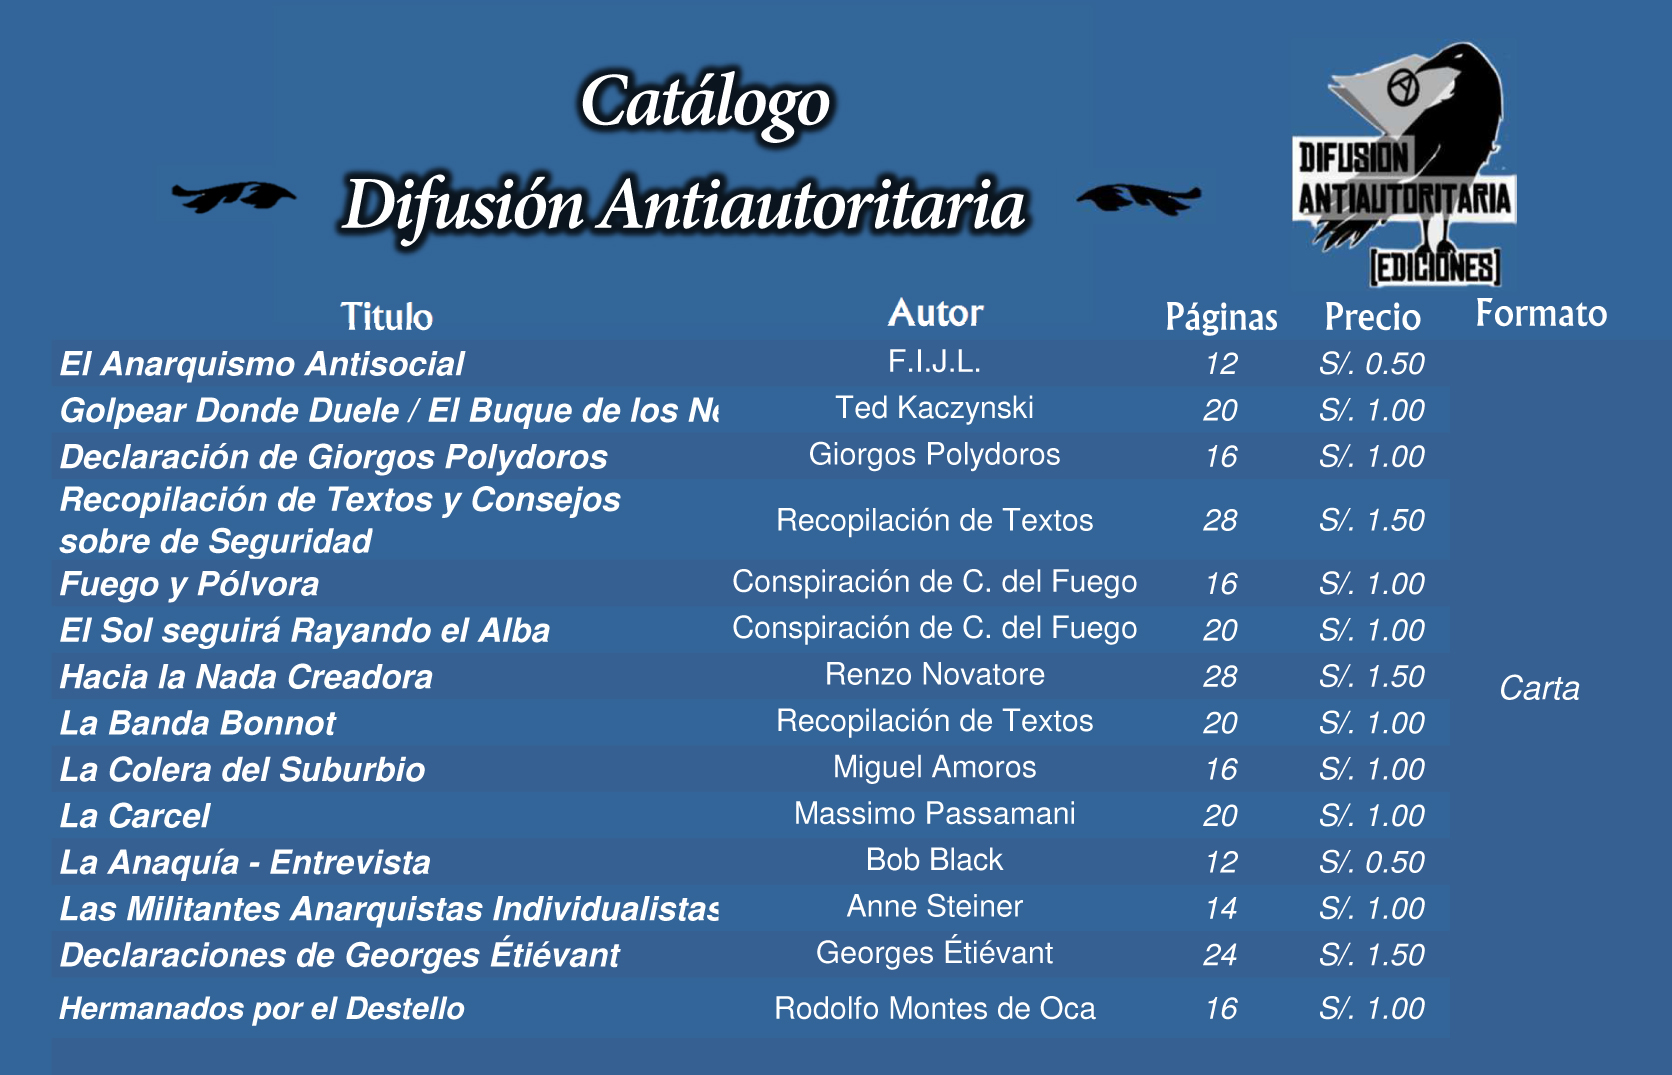 Catalogo Difusion A-Ediciones